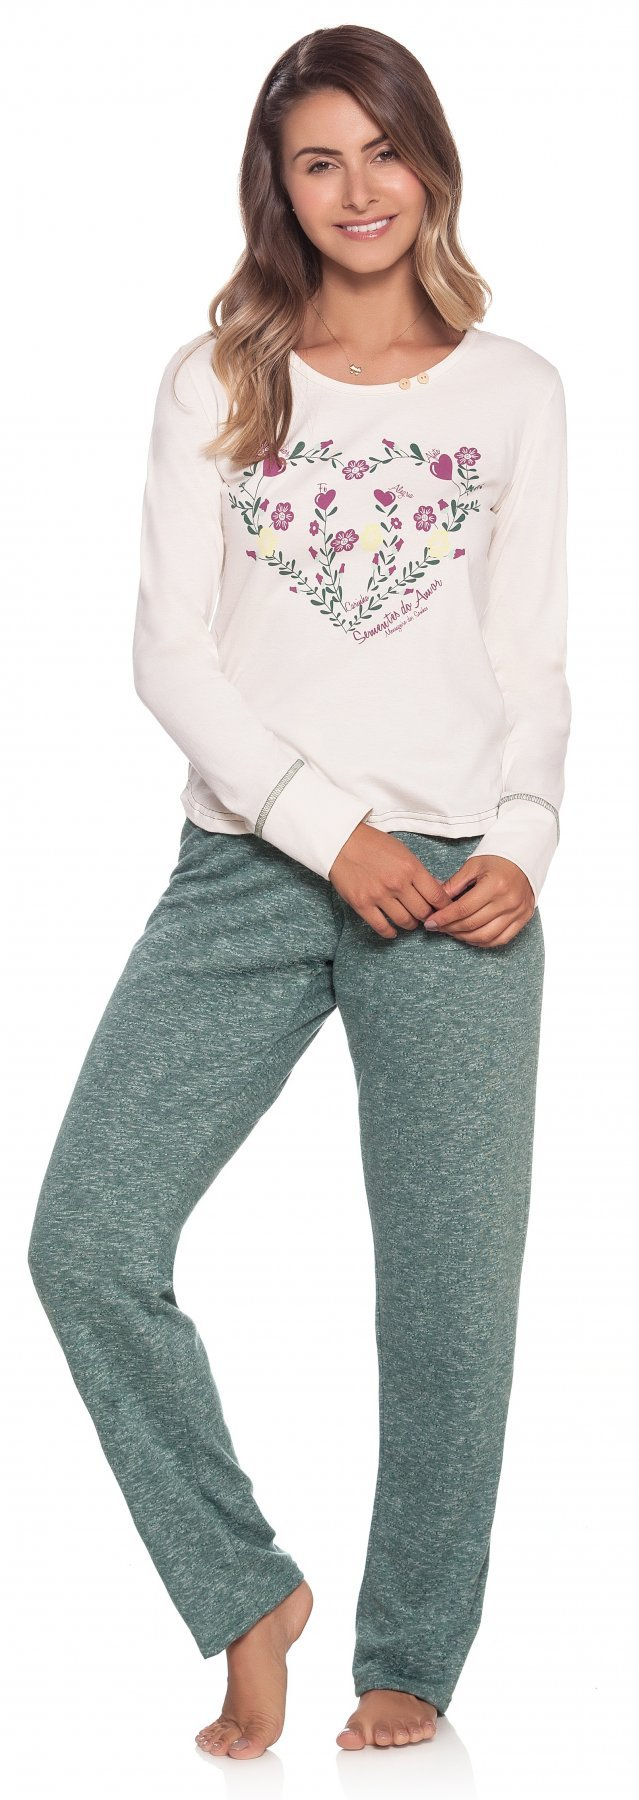 Pijama Longo Natureza Sementes do Amor Inverno